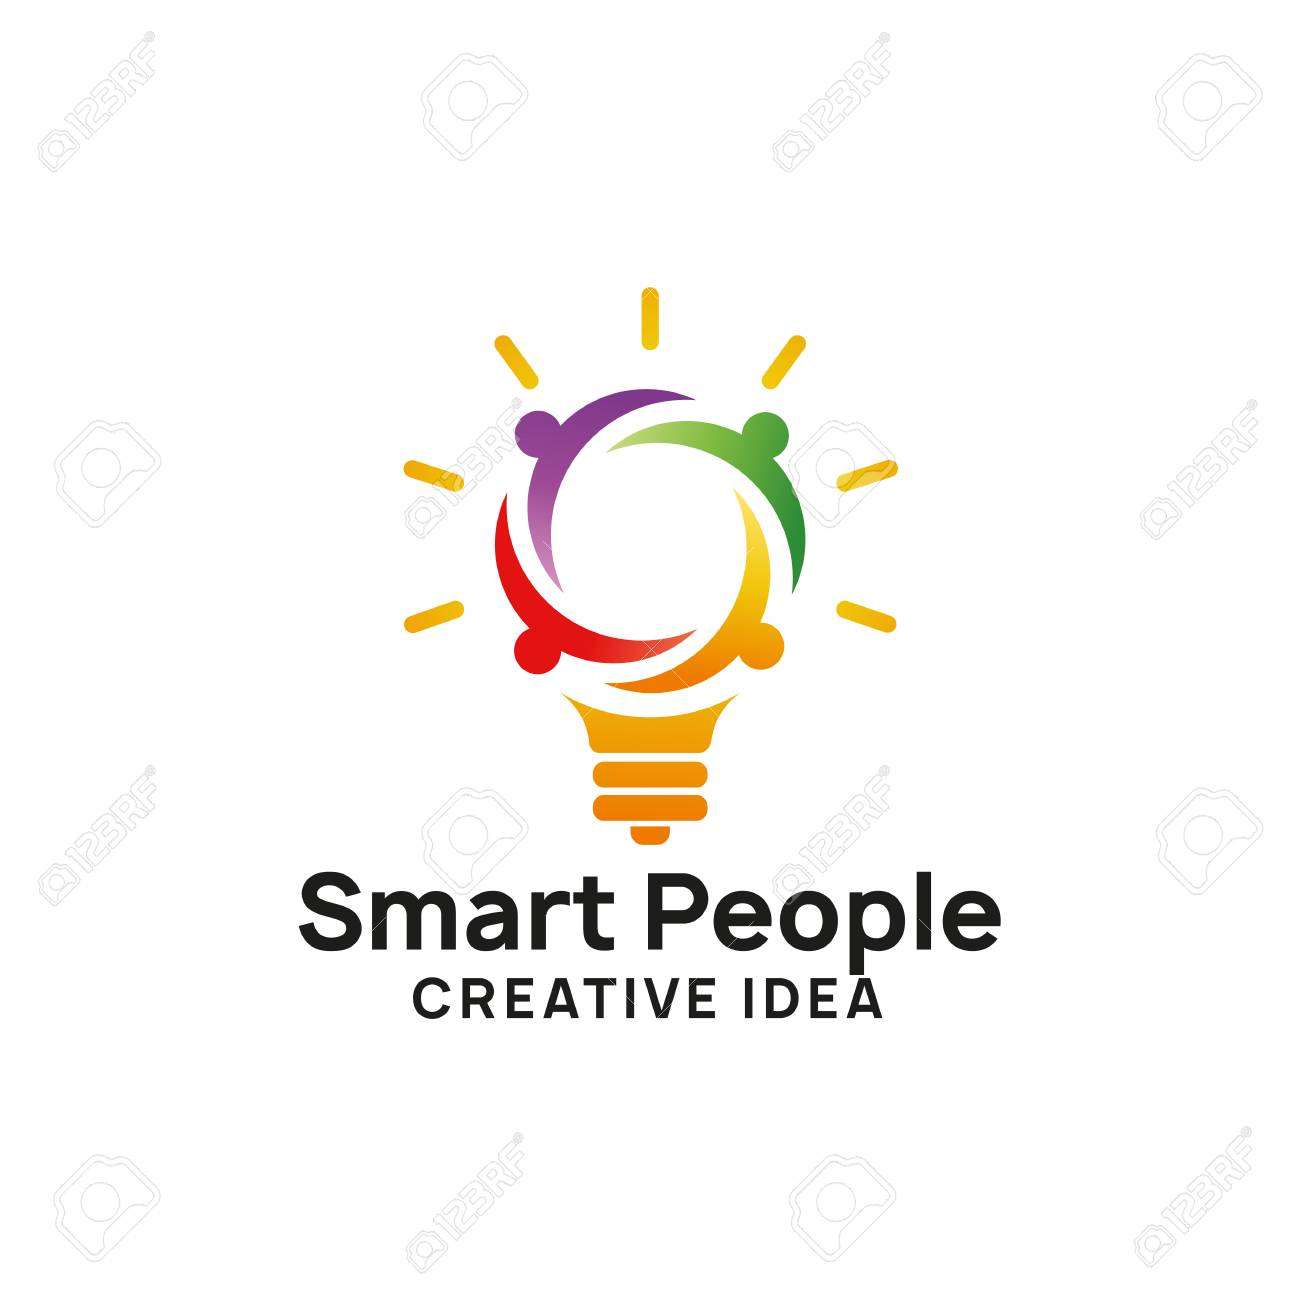 smart people logo design template. creative idea logo designs. bulb icon symbol design - 117595485